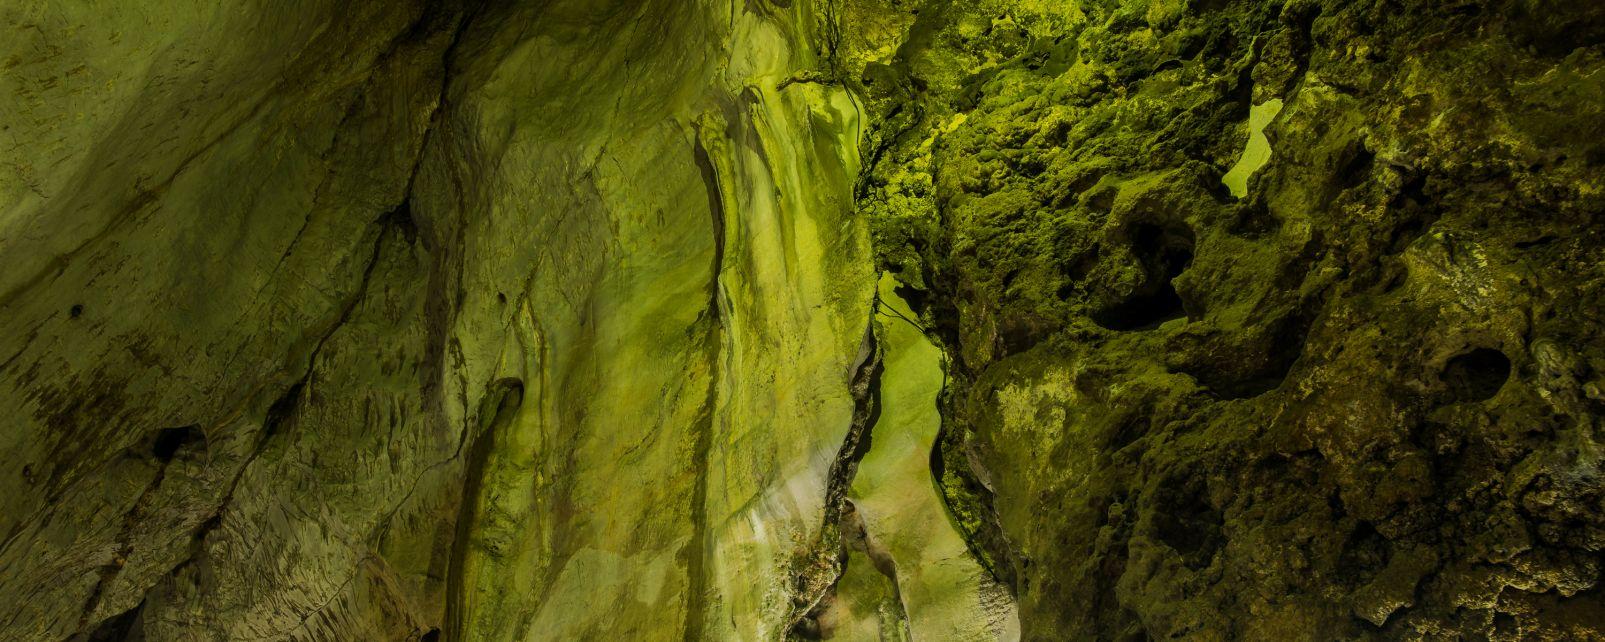 Les paysages, Norvège, Europe, Scandinavie, grotte, spéléologie, dollsteinhola